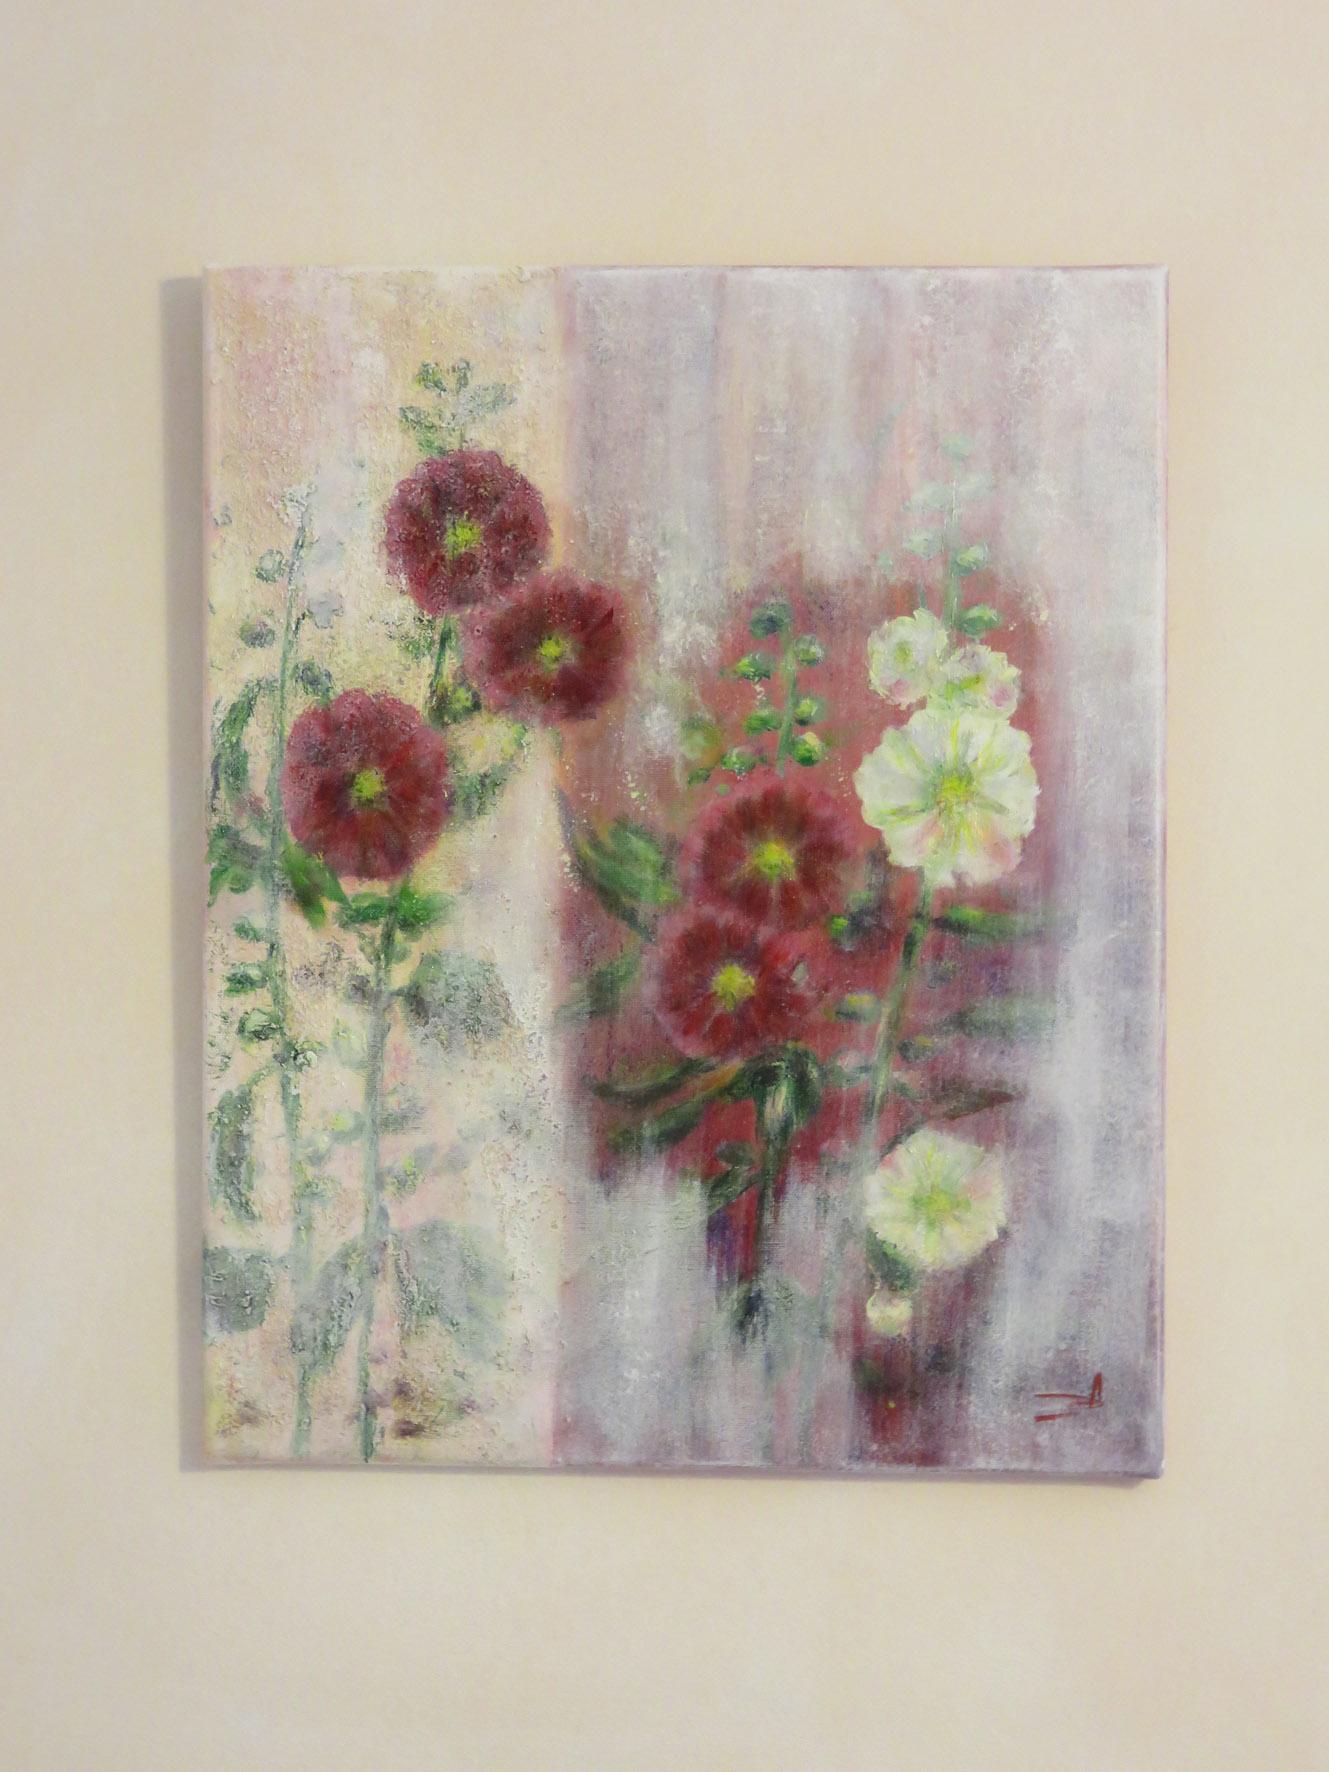 Roses tremieres, Nov 17